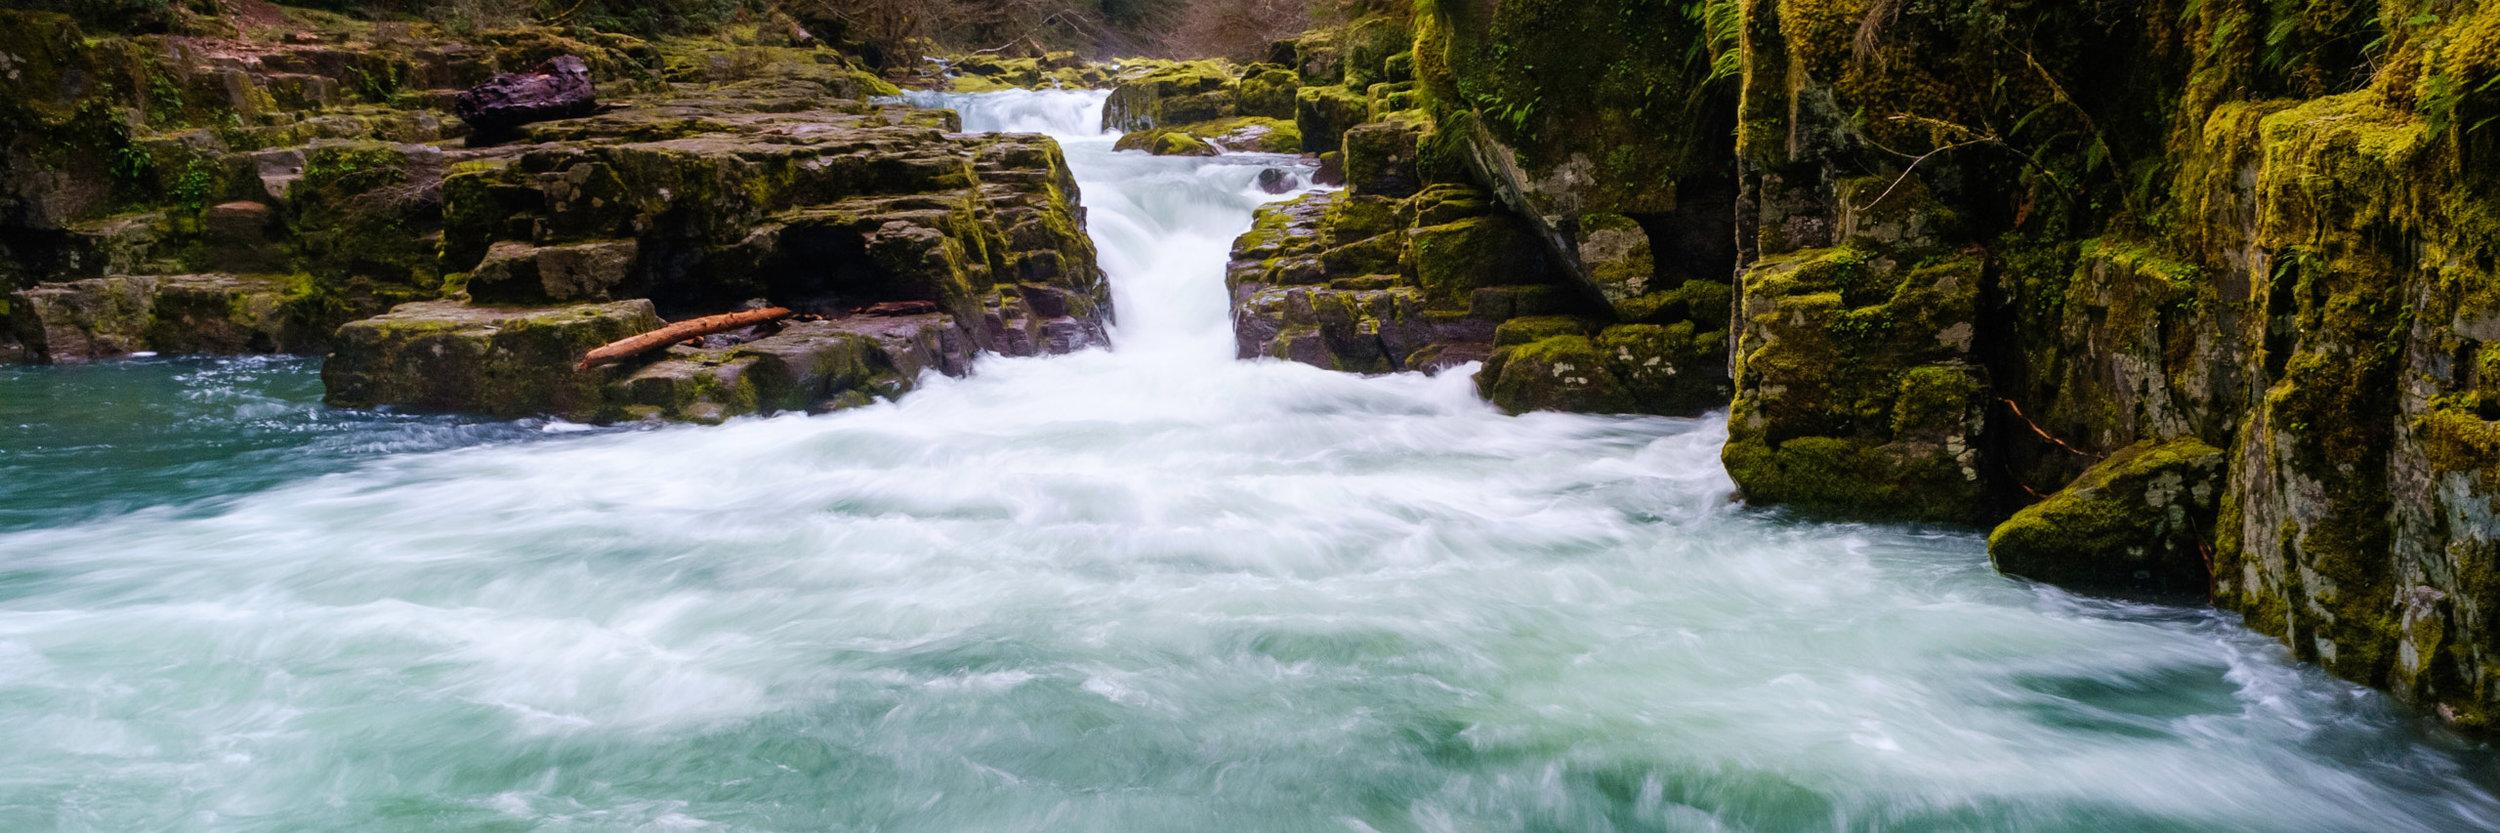 Brice Creek_2014 - -71-20140308_Brice_Creek_Oregon_0023.jpg